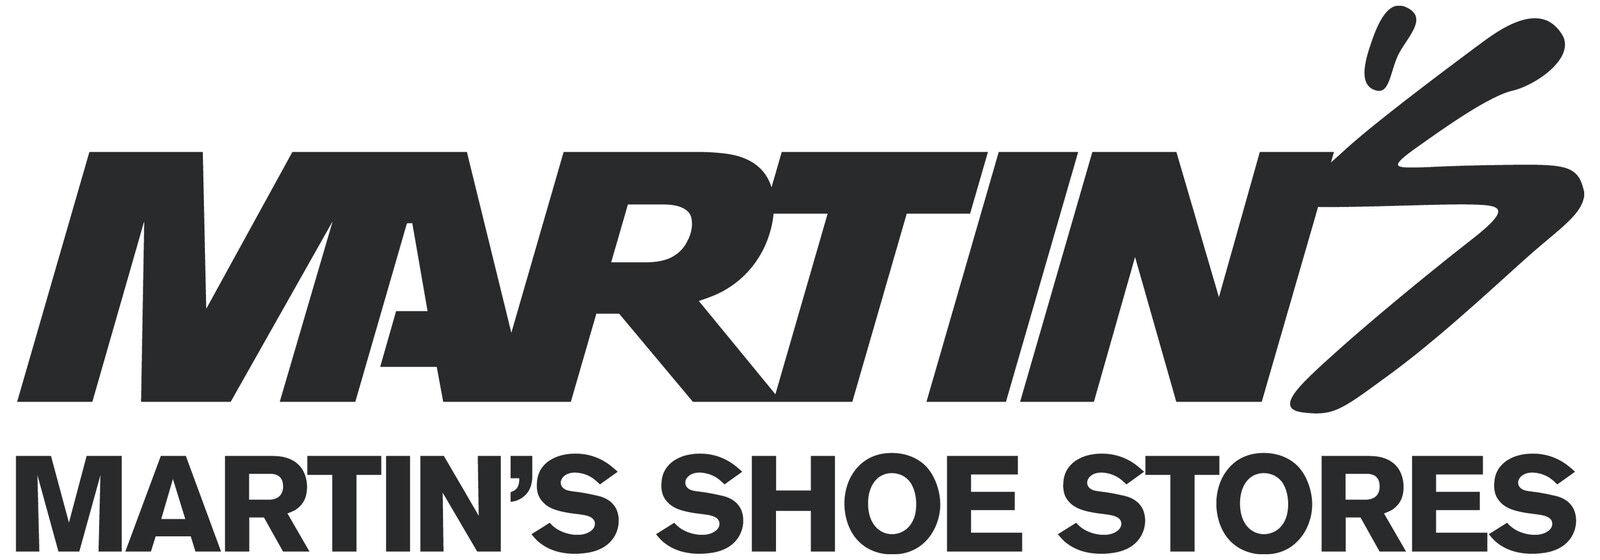 Martins Shoe Stores